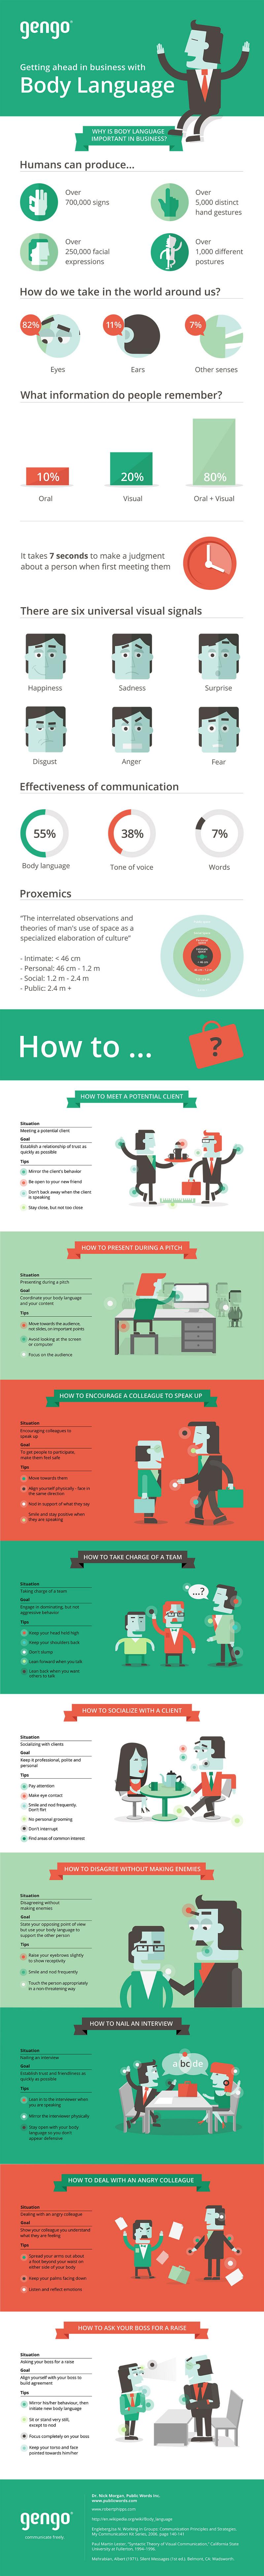 Business-Body-Language